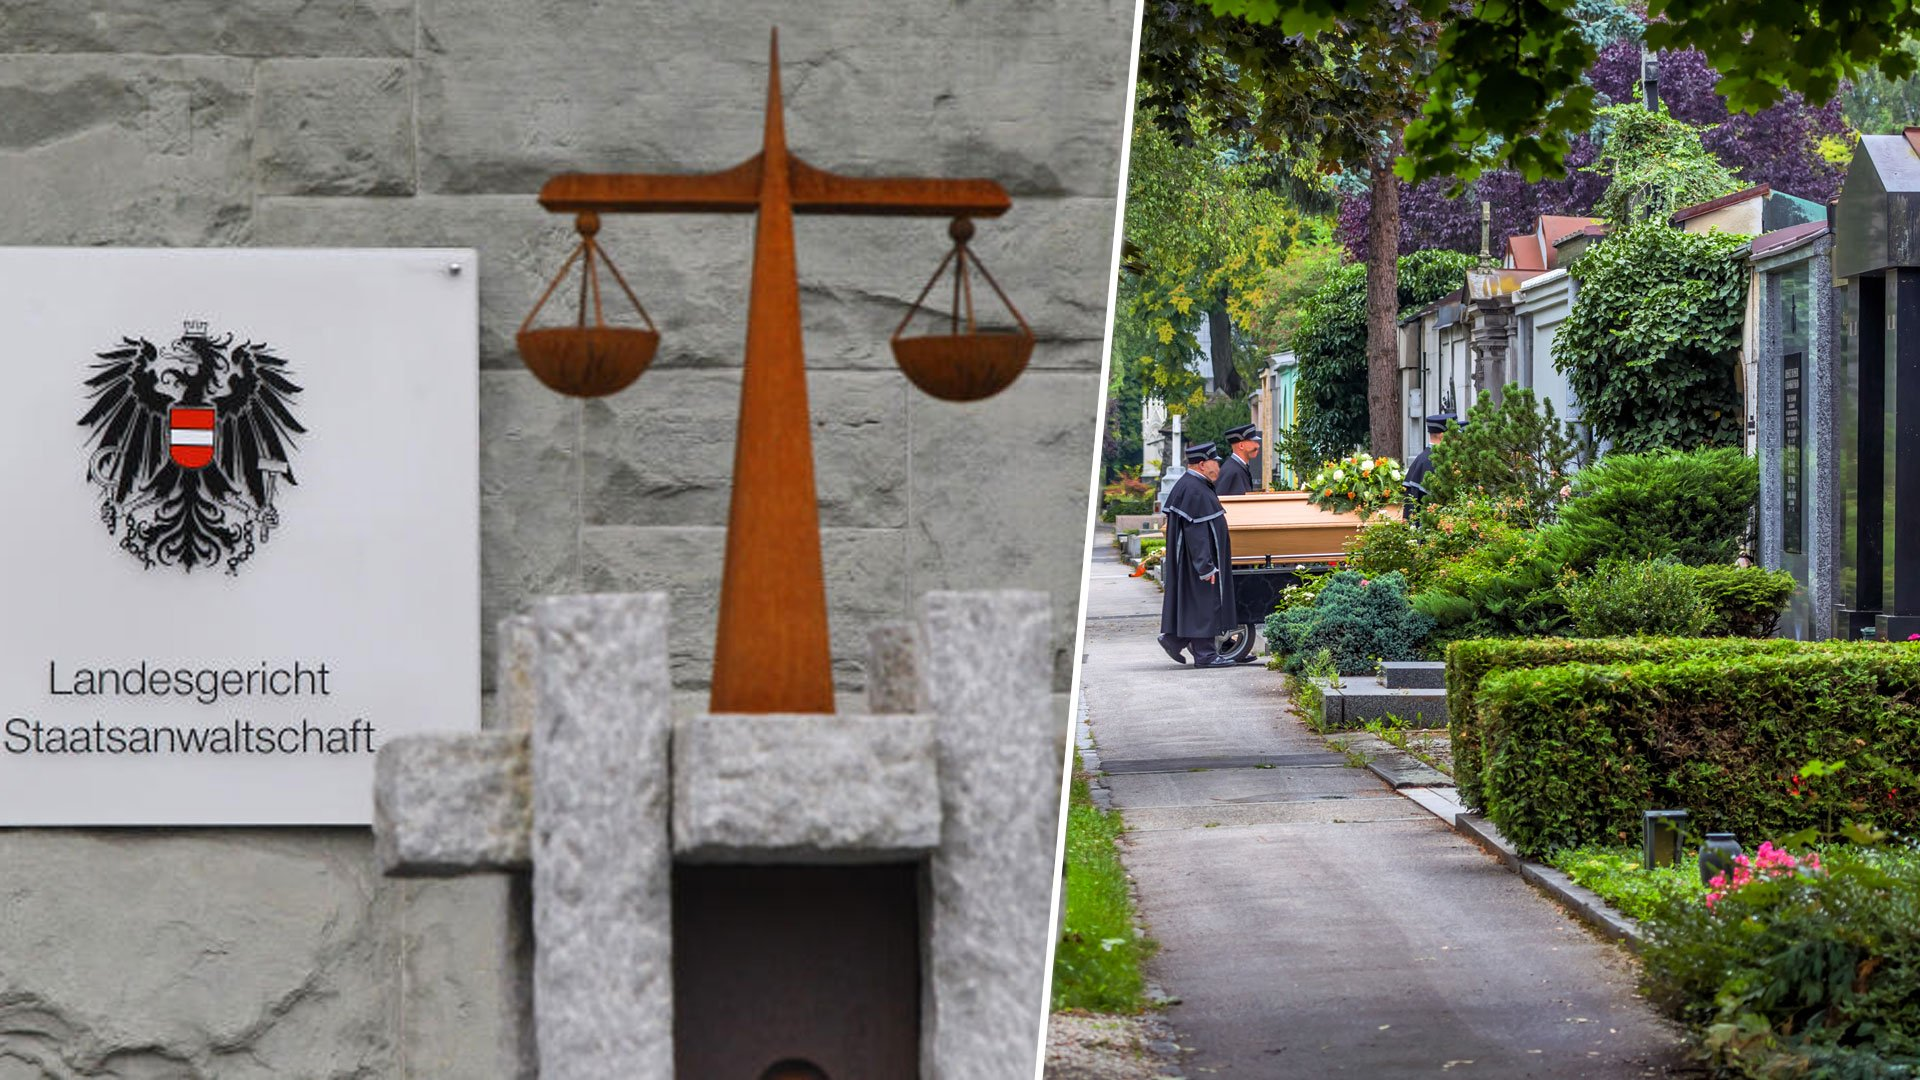 Vorarlberg: Morddrohungen bei Trauerfeier geäußert